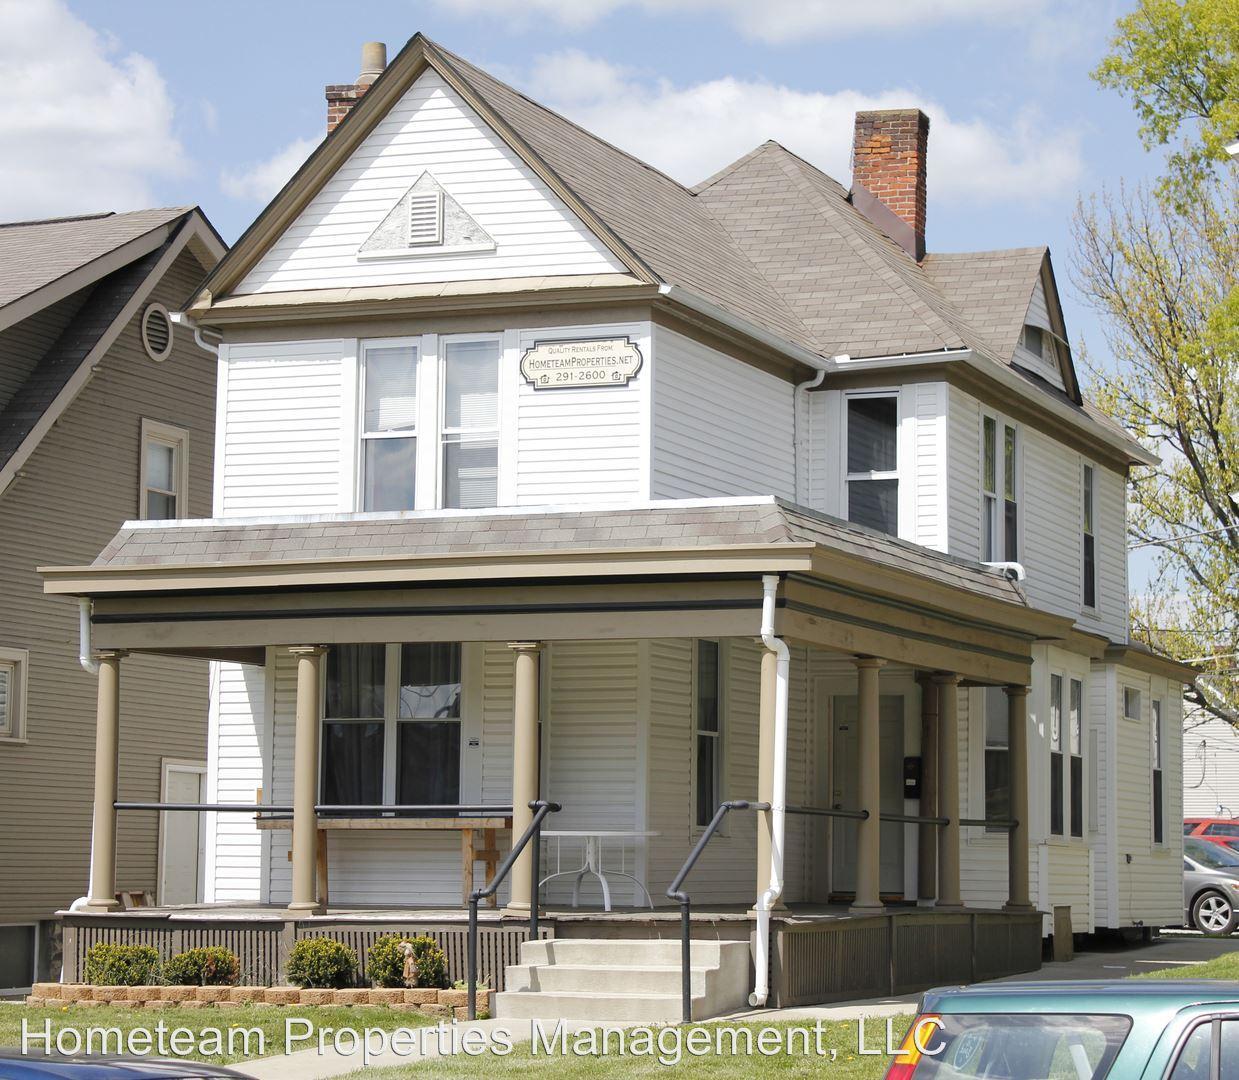 108 W. Northwood Ave